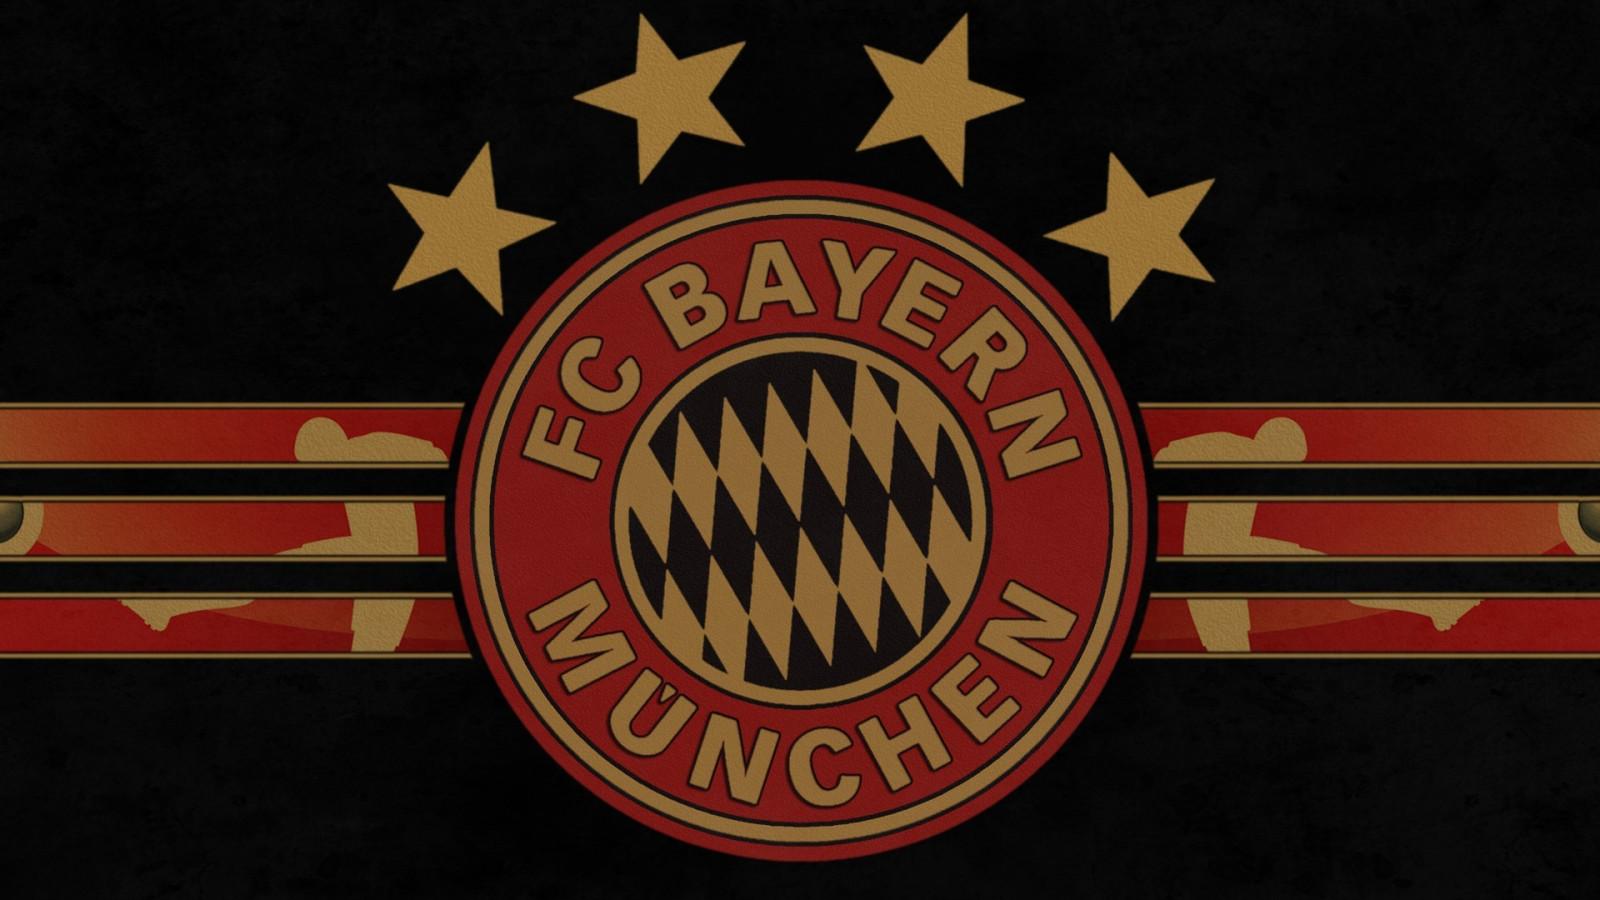 Wallpaper Ilustrasi Logo Bendera Bayern Munich Bayern